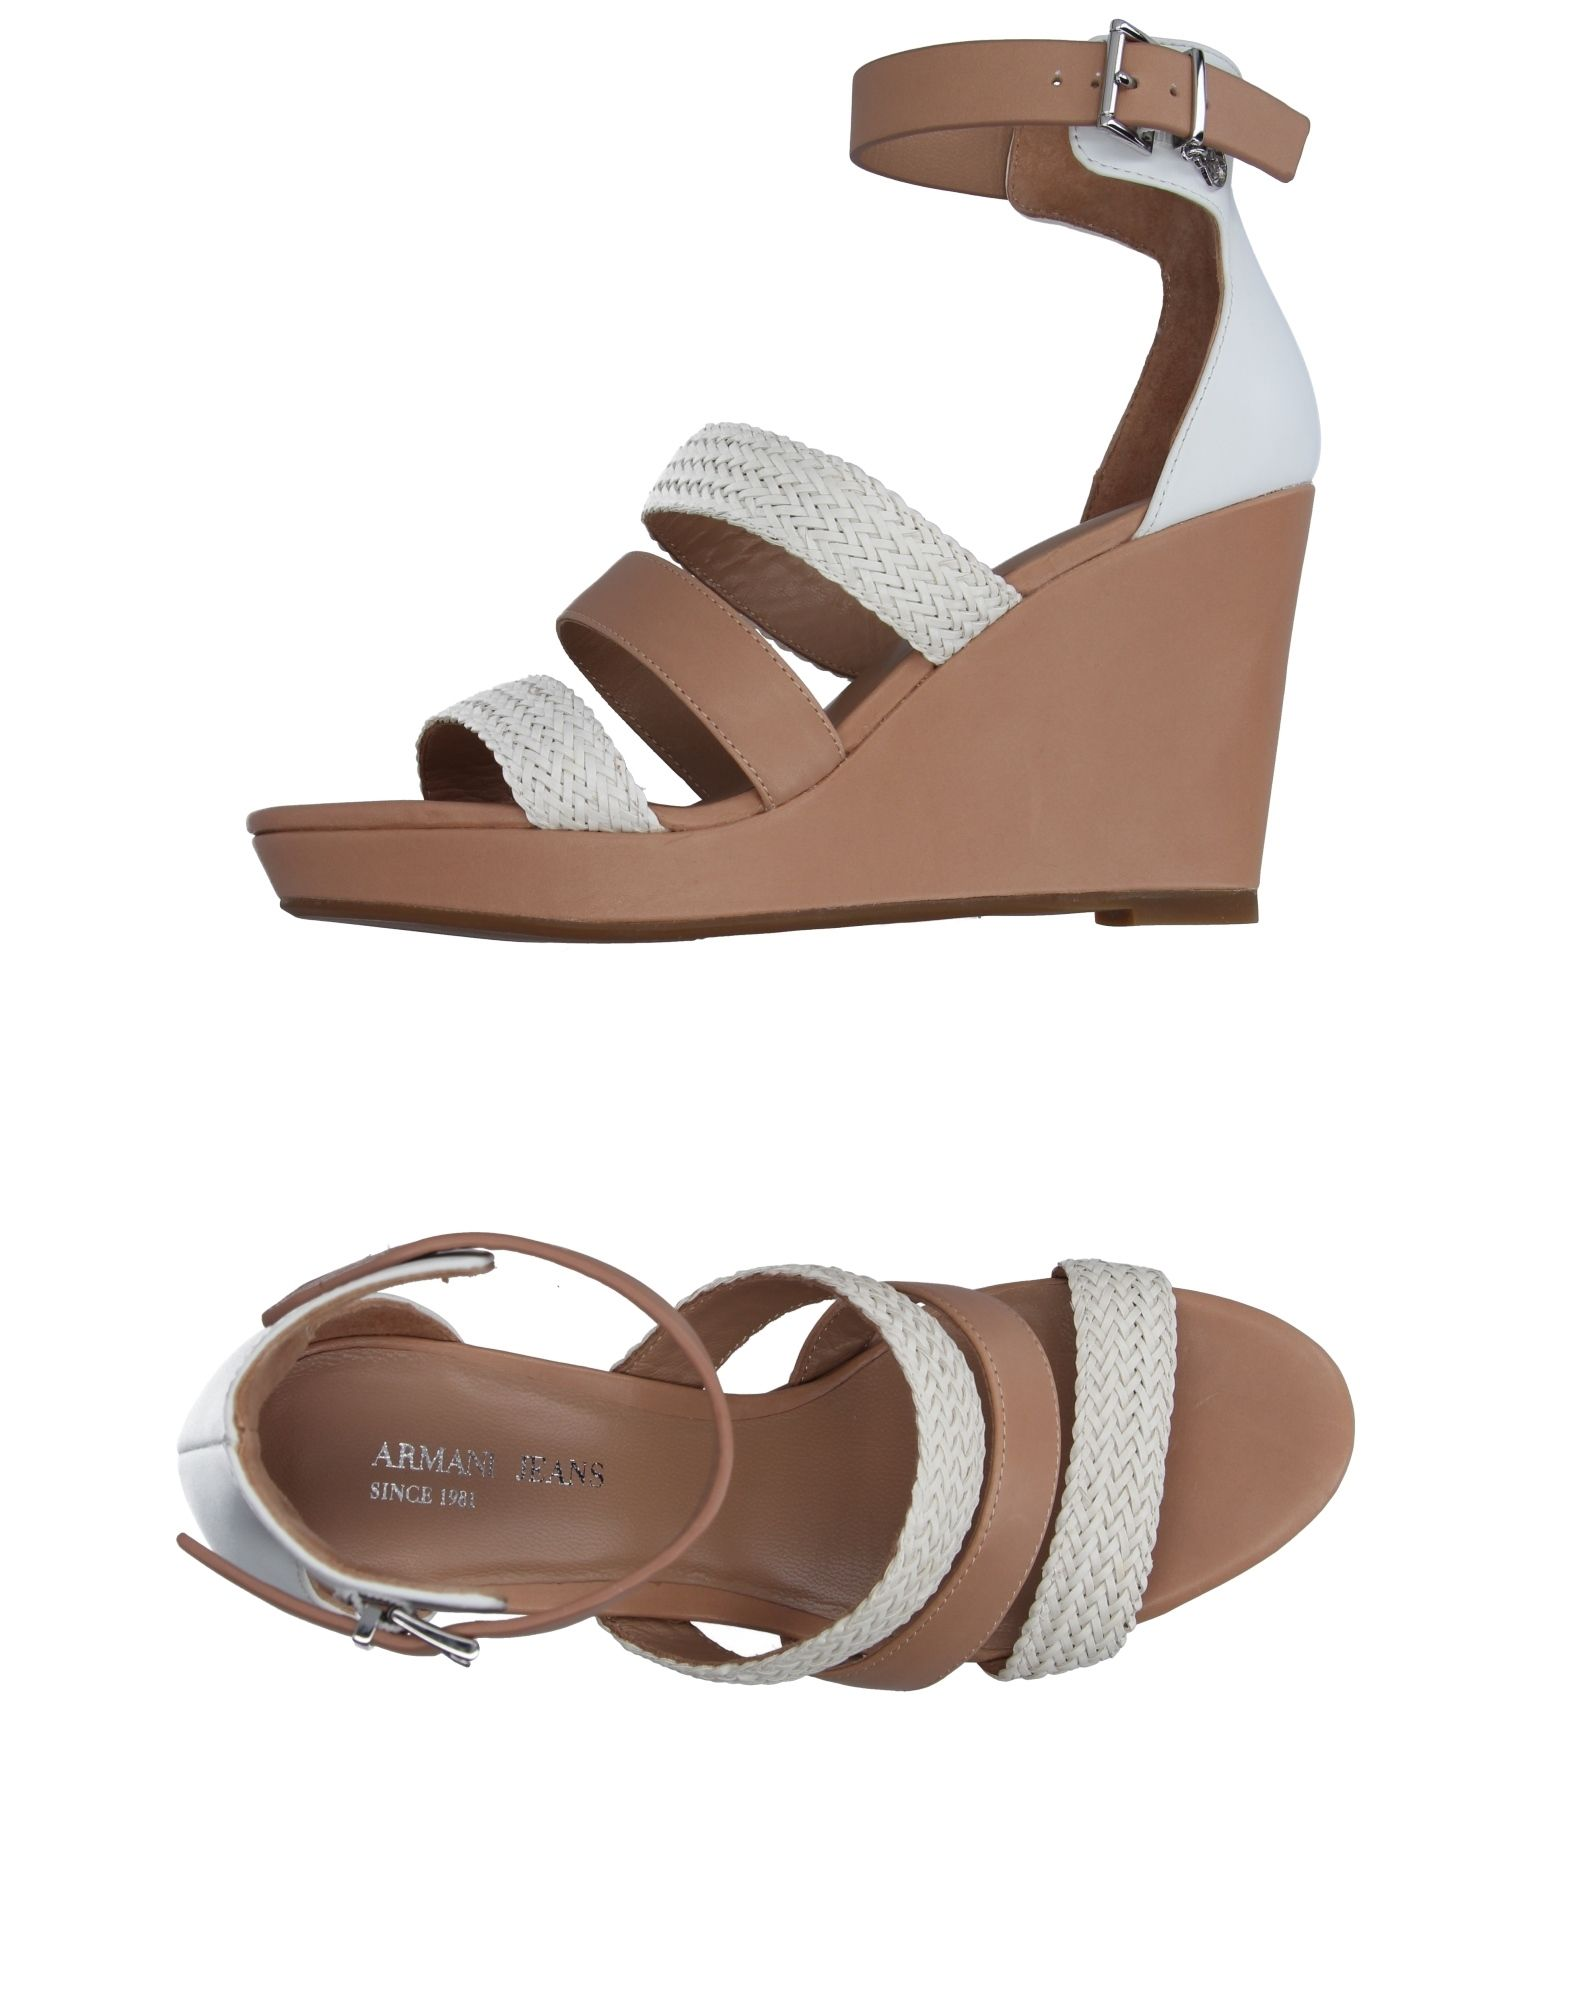 Armani Jeans Sandalen Damen beliebte  11170319PM Gute Qualität beliebte Damen Schuhe c8dbbe